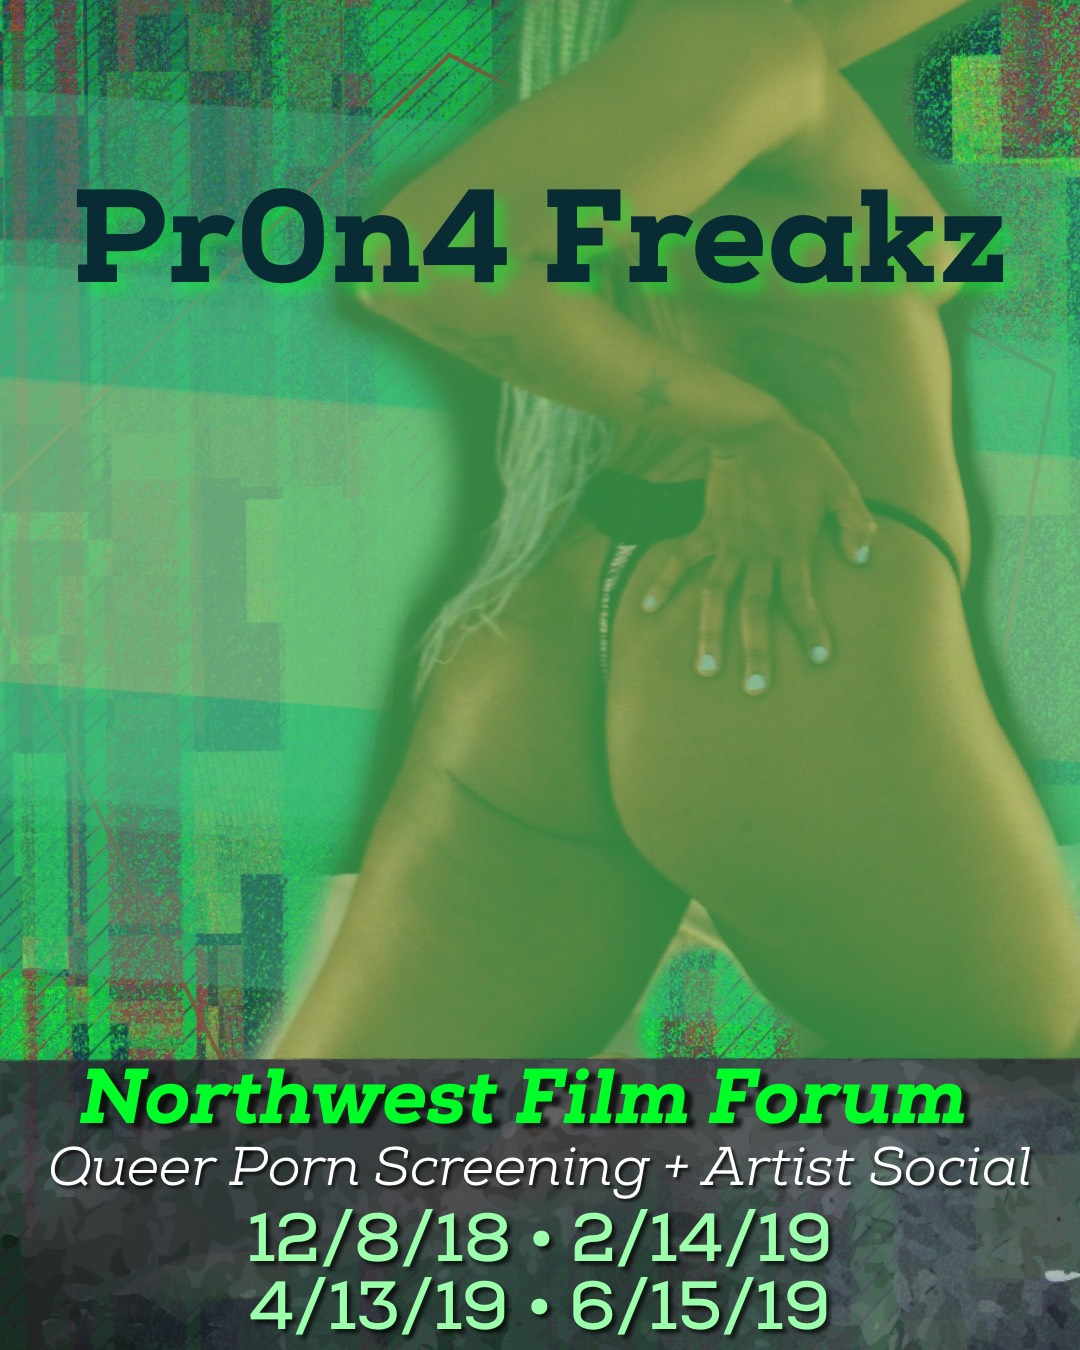 PronForFreakz